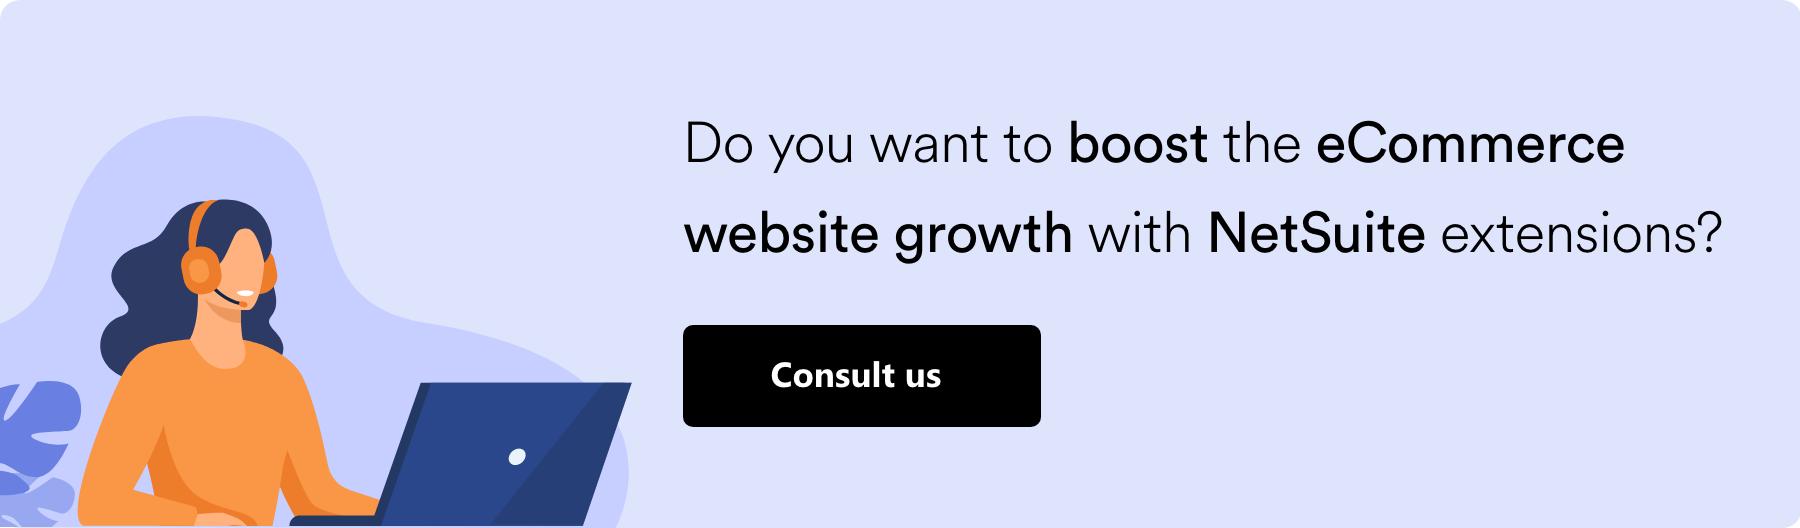 build eCommerce website with NetSuite SuiteCommerce Partners